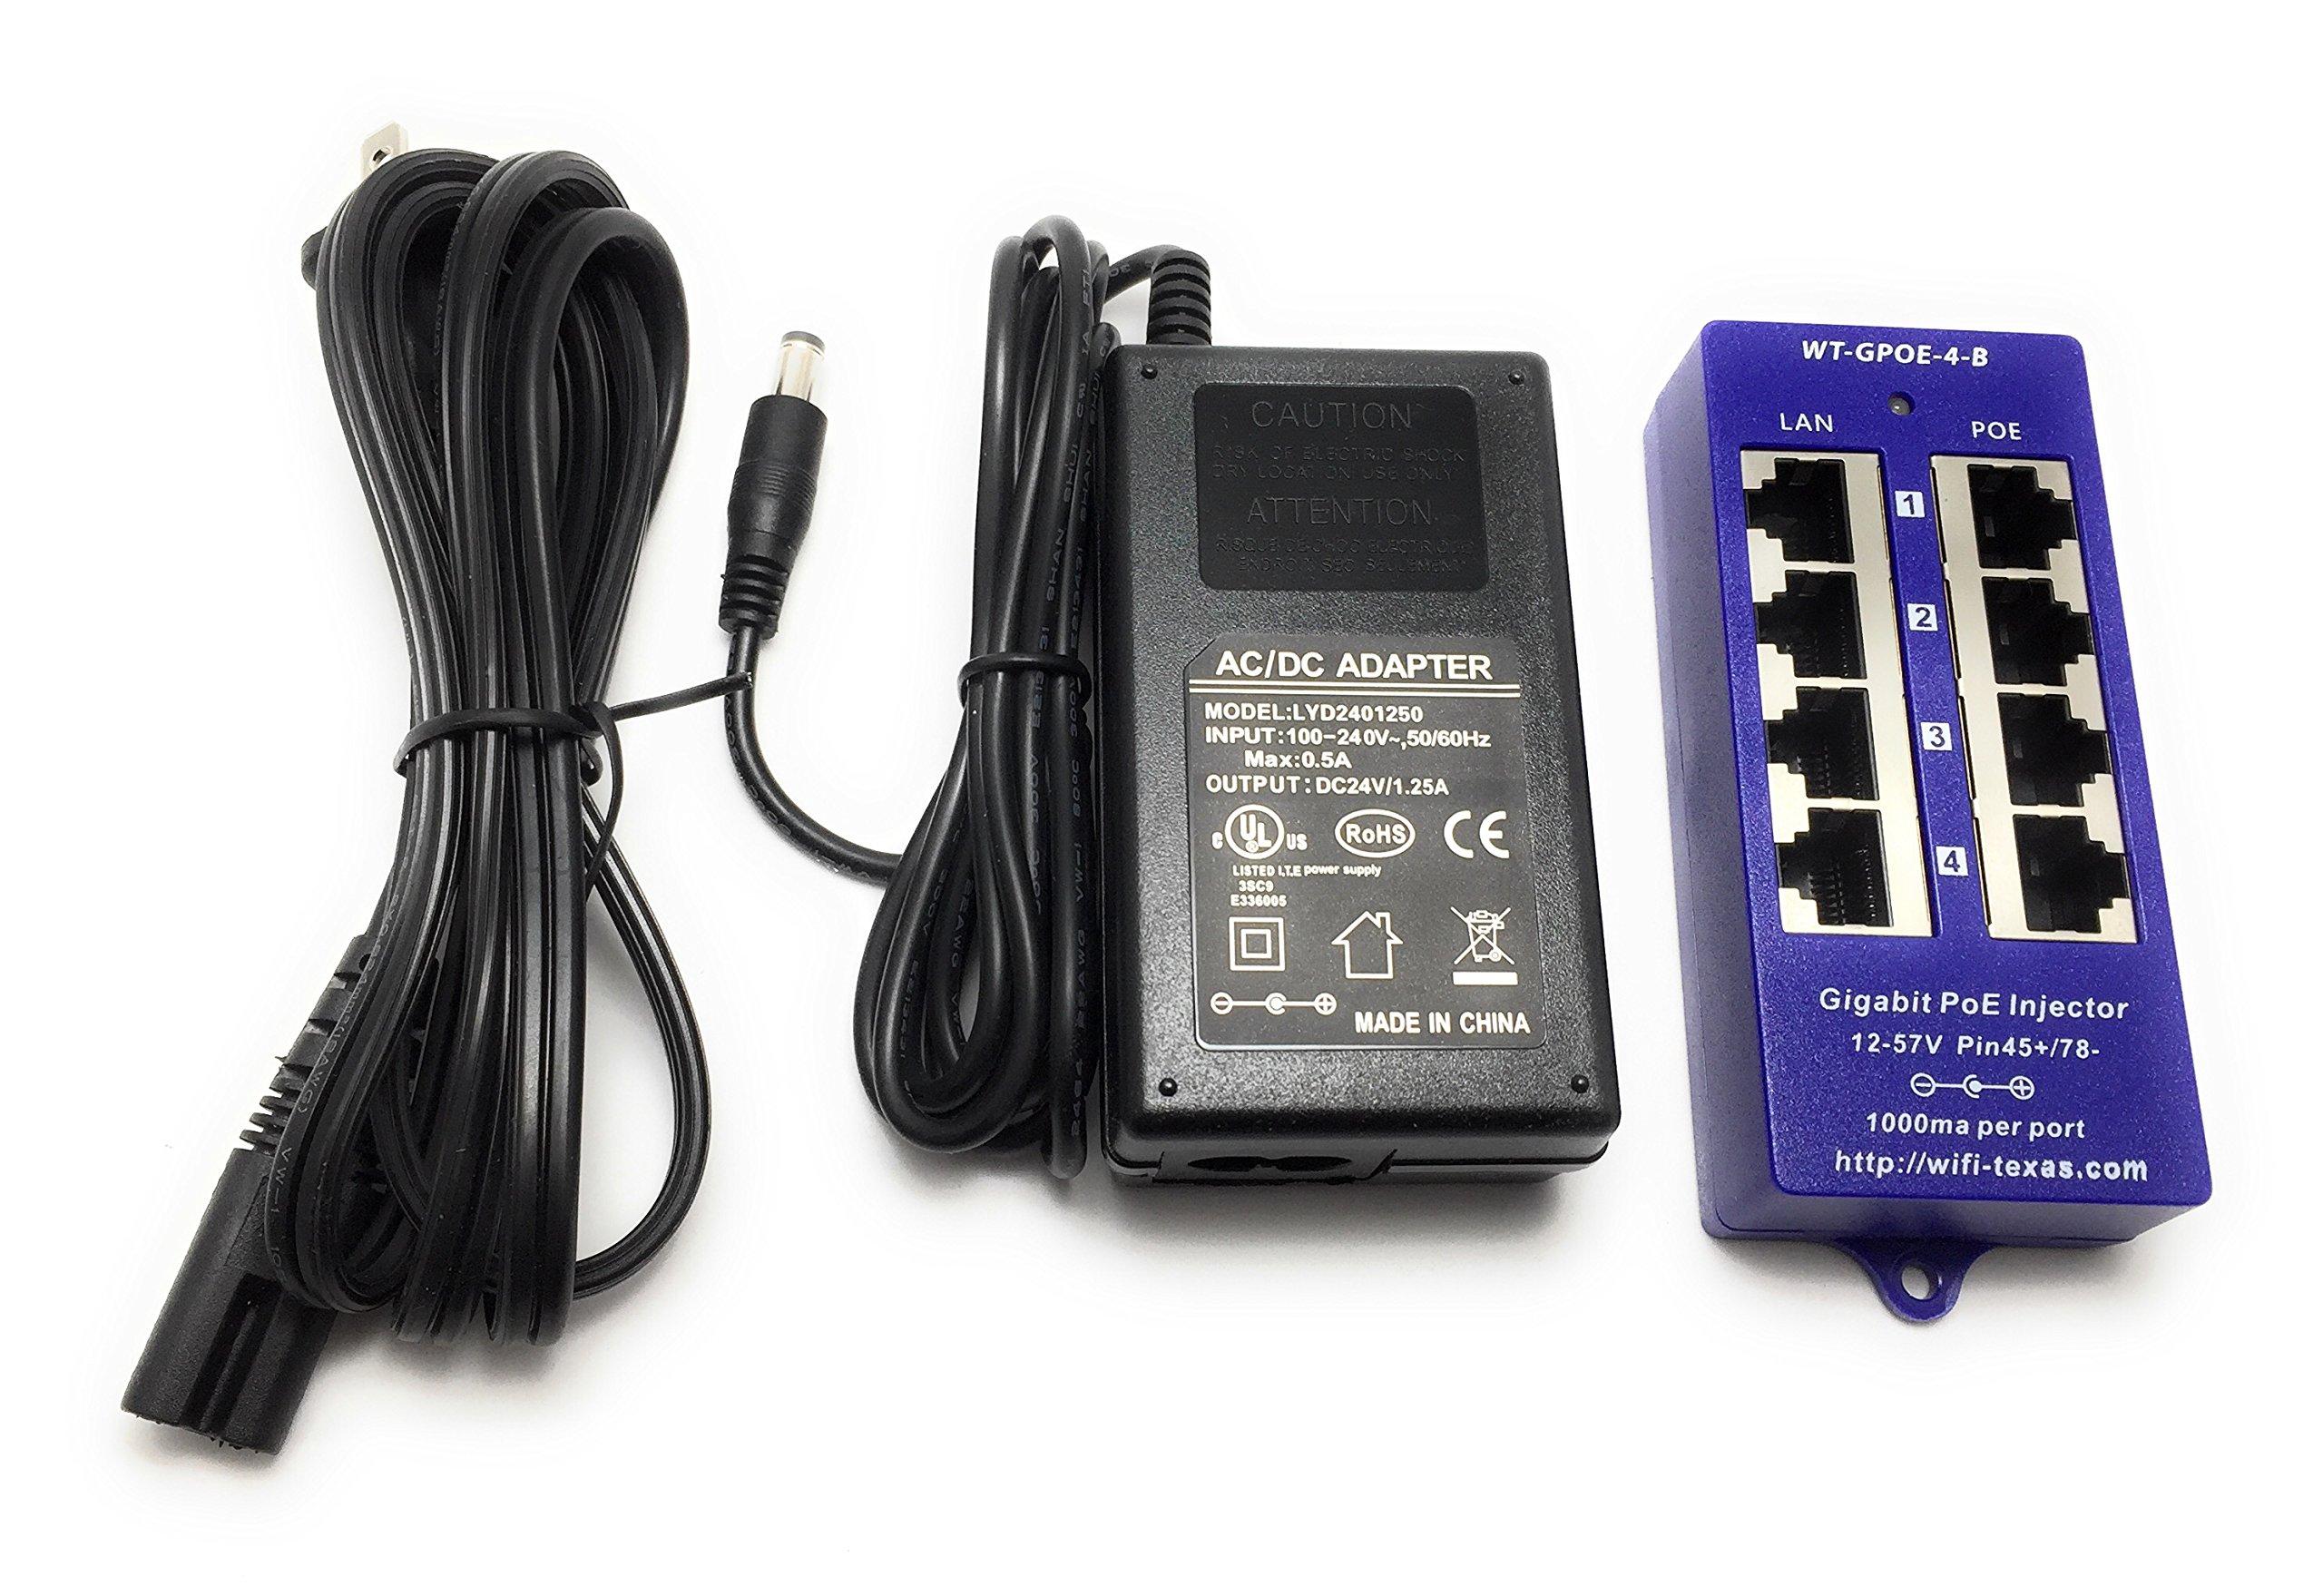 WT-GPOE-4B-24v30w Gigabit 4 Port Passive PoE Power over Ethernet Injector - 24 volts for Ubiquiti, Mikrotik